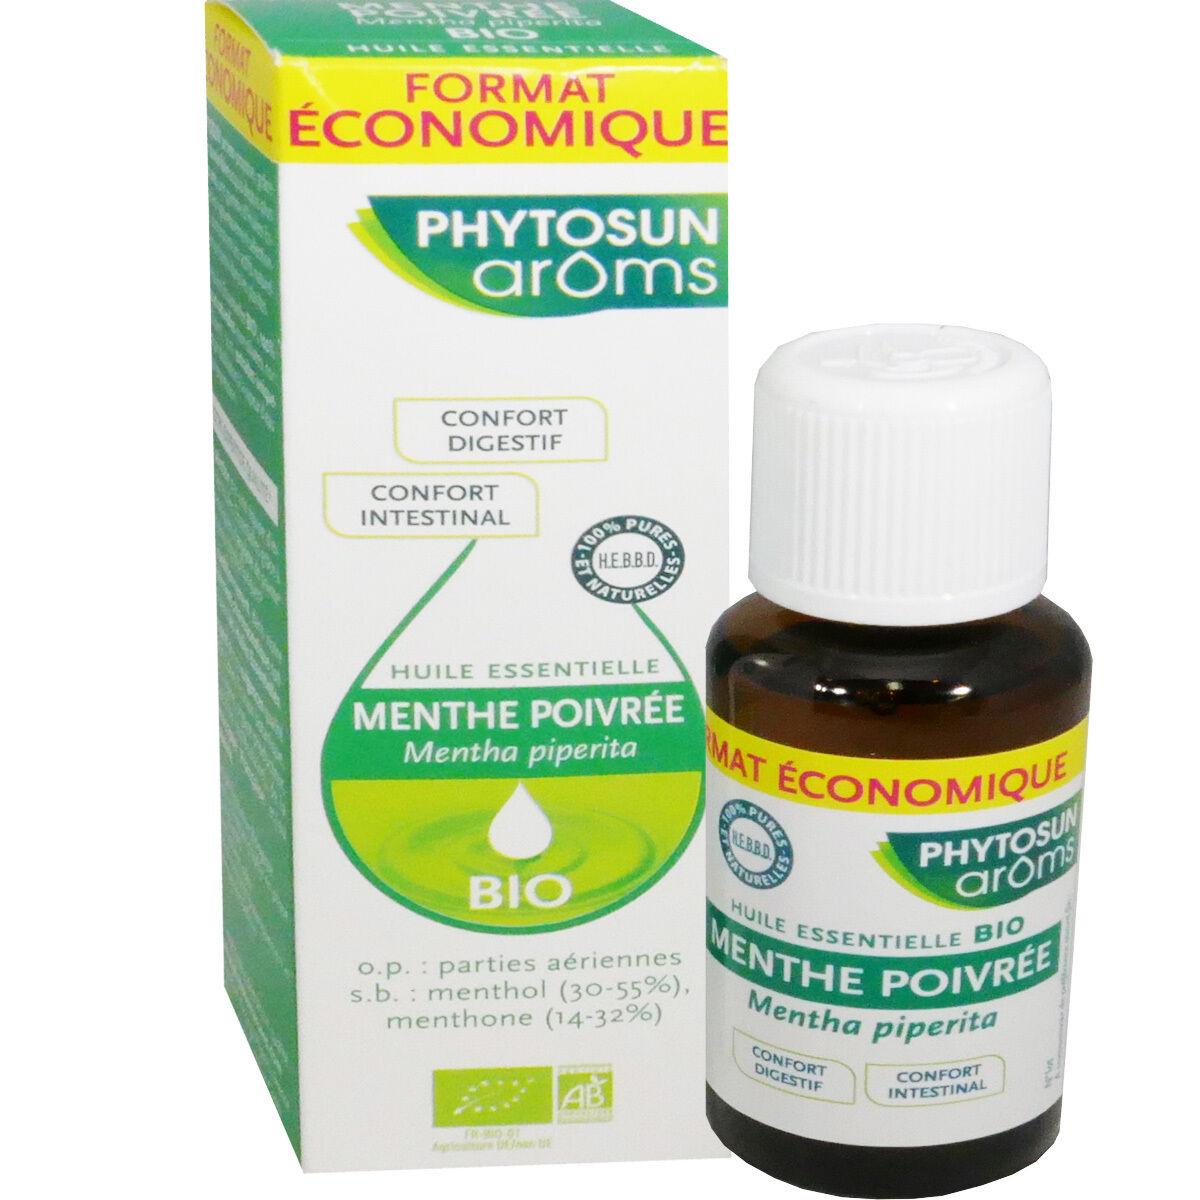 PHYTOSUN AROMS Phytosunaroms menthe poivree digestion 30 ml